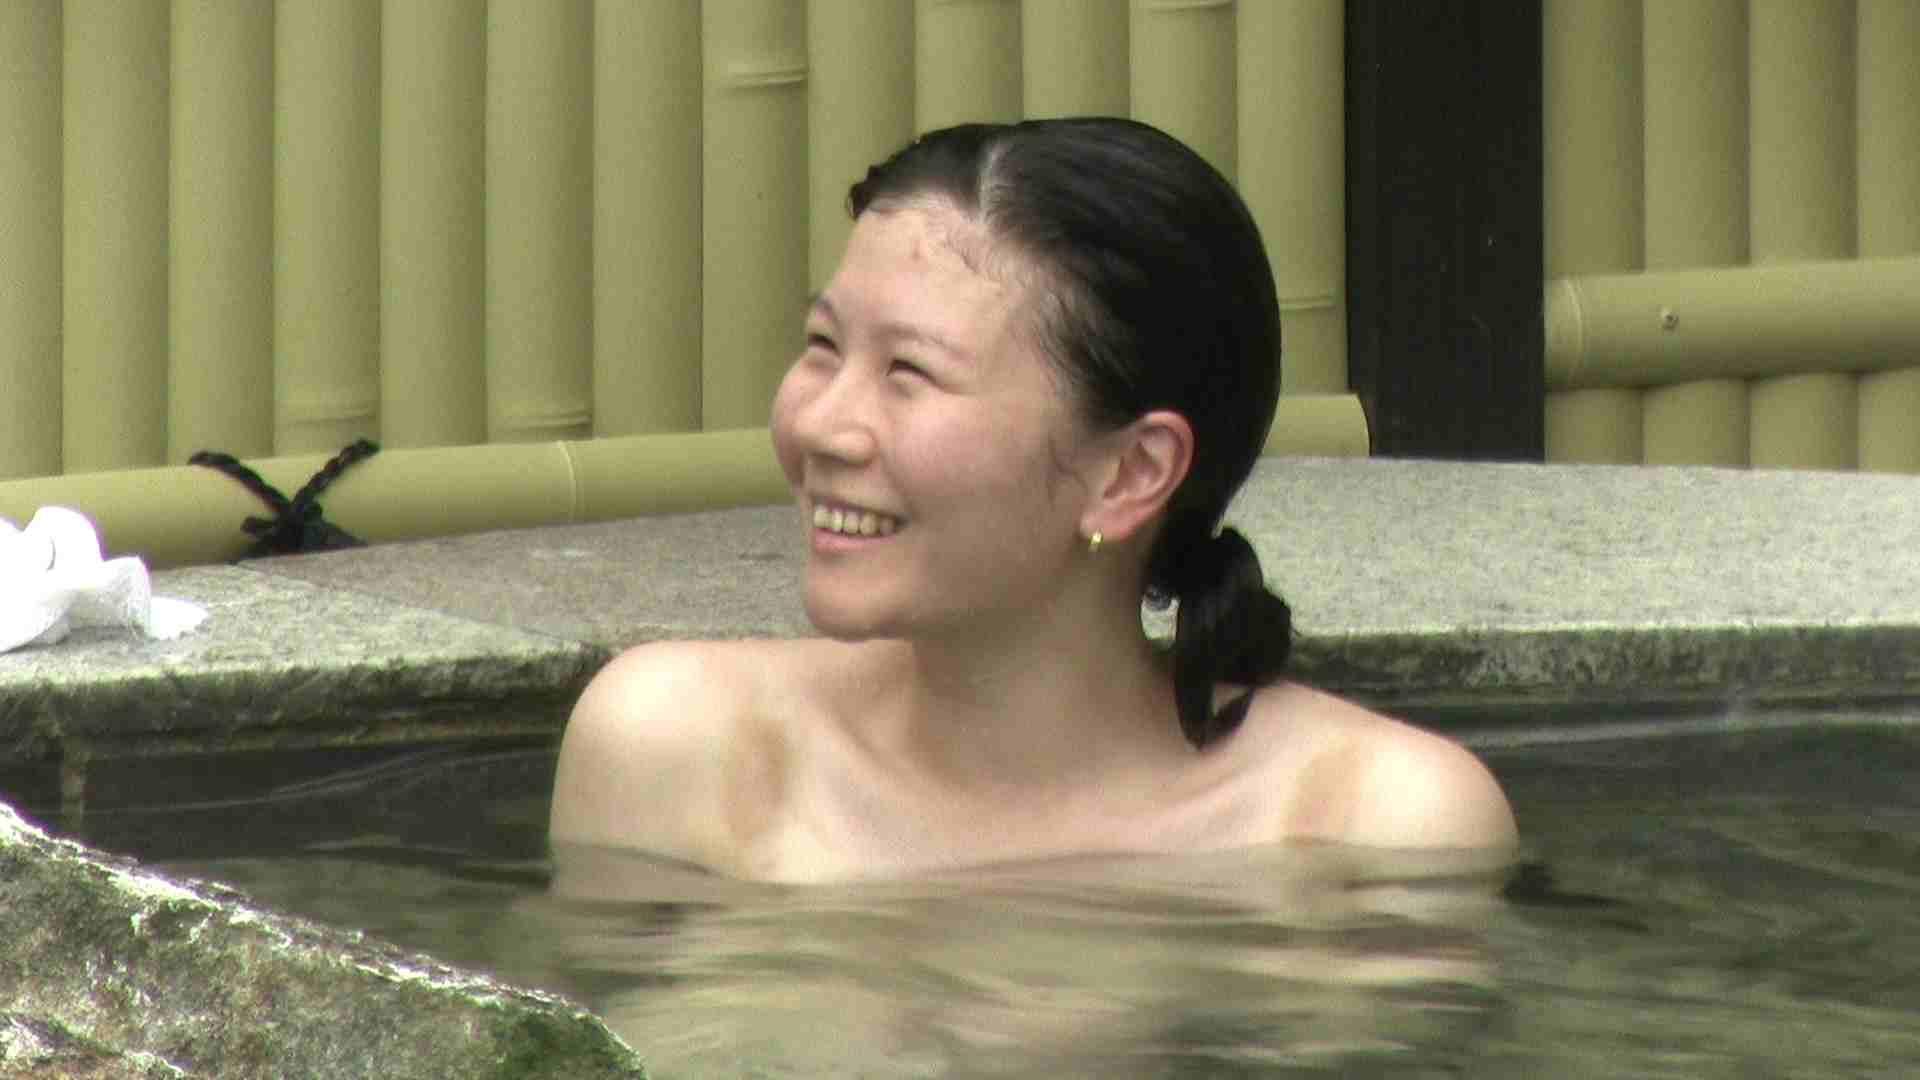 Aquaな露天風呂Vol.187 盗撮   HなOL  96pic 37